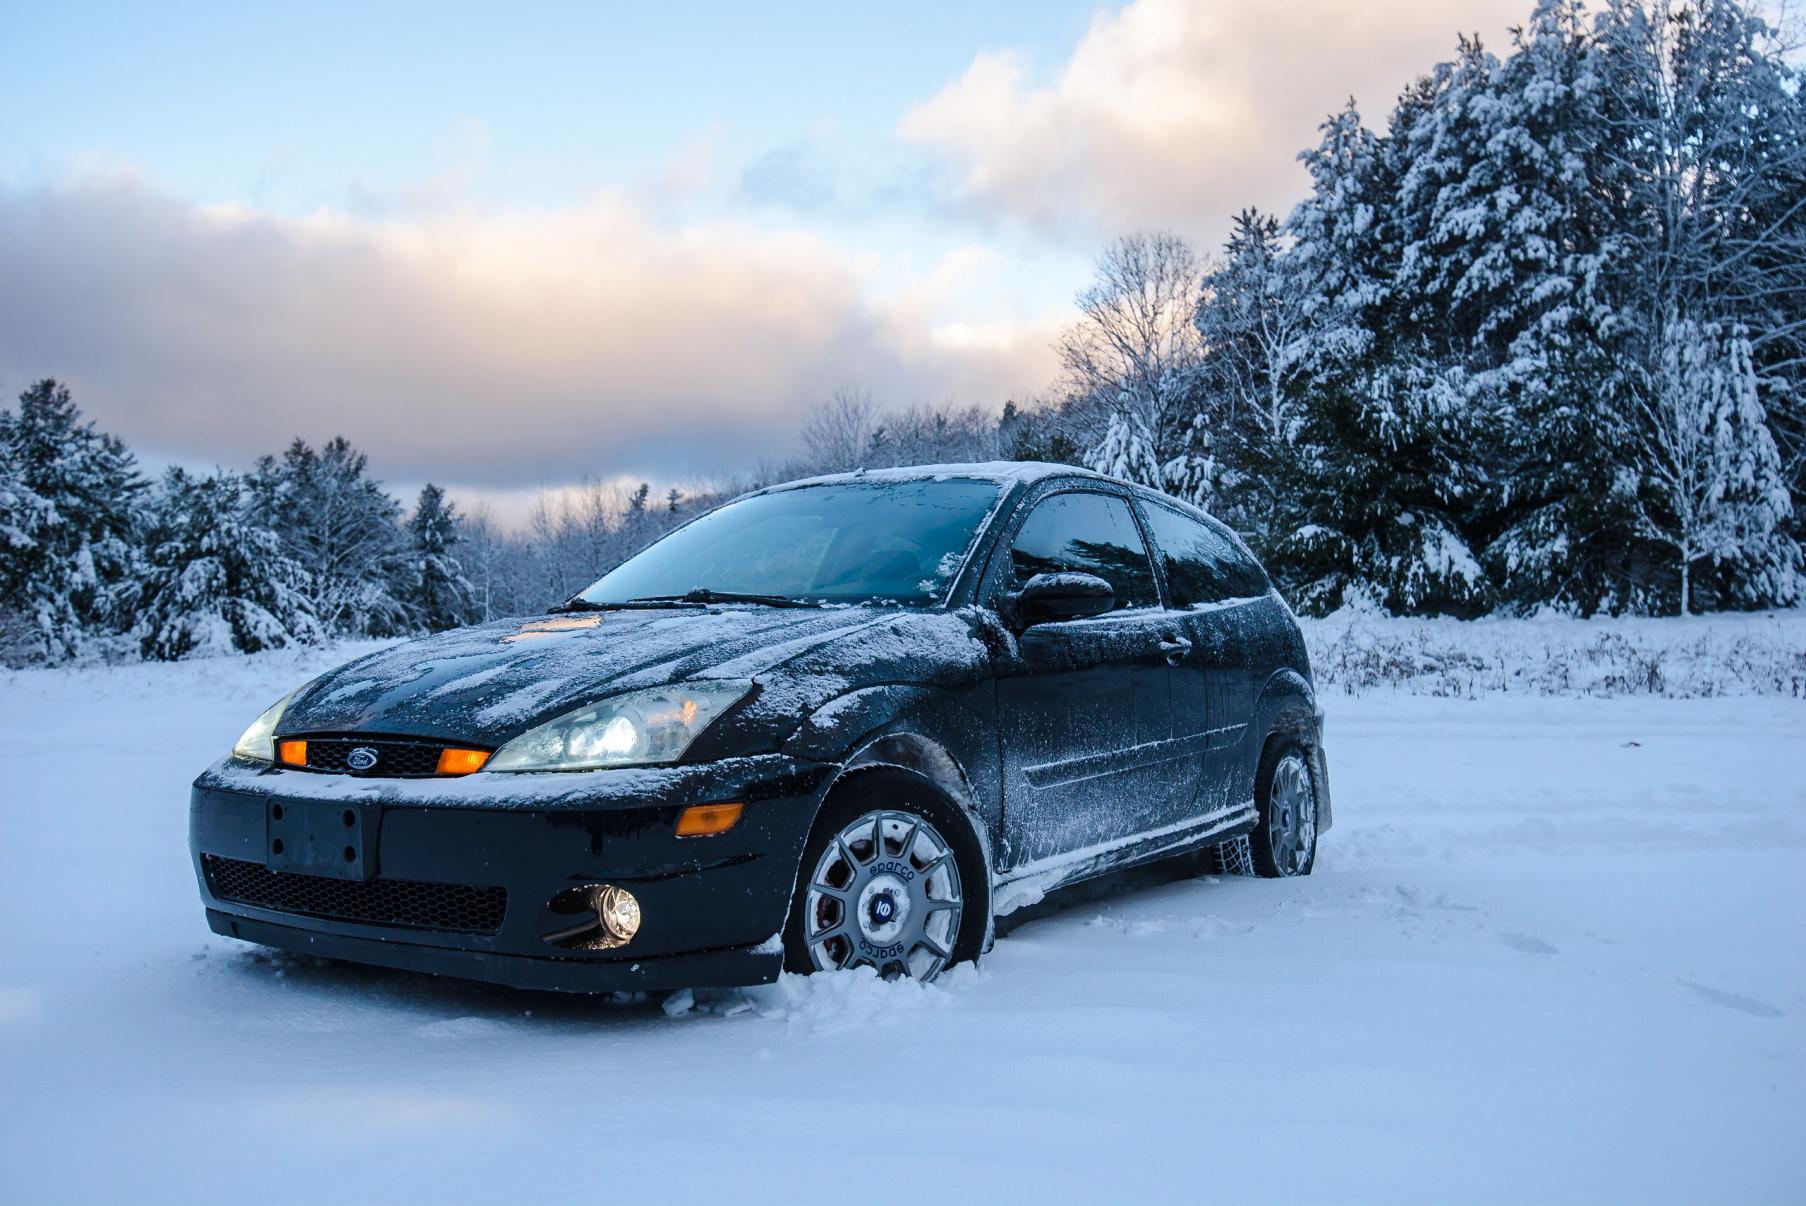 Rally Focus SVT Build-1901_m22_new_year2k19__077.jpg